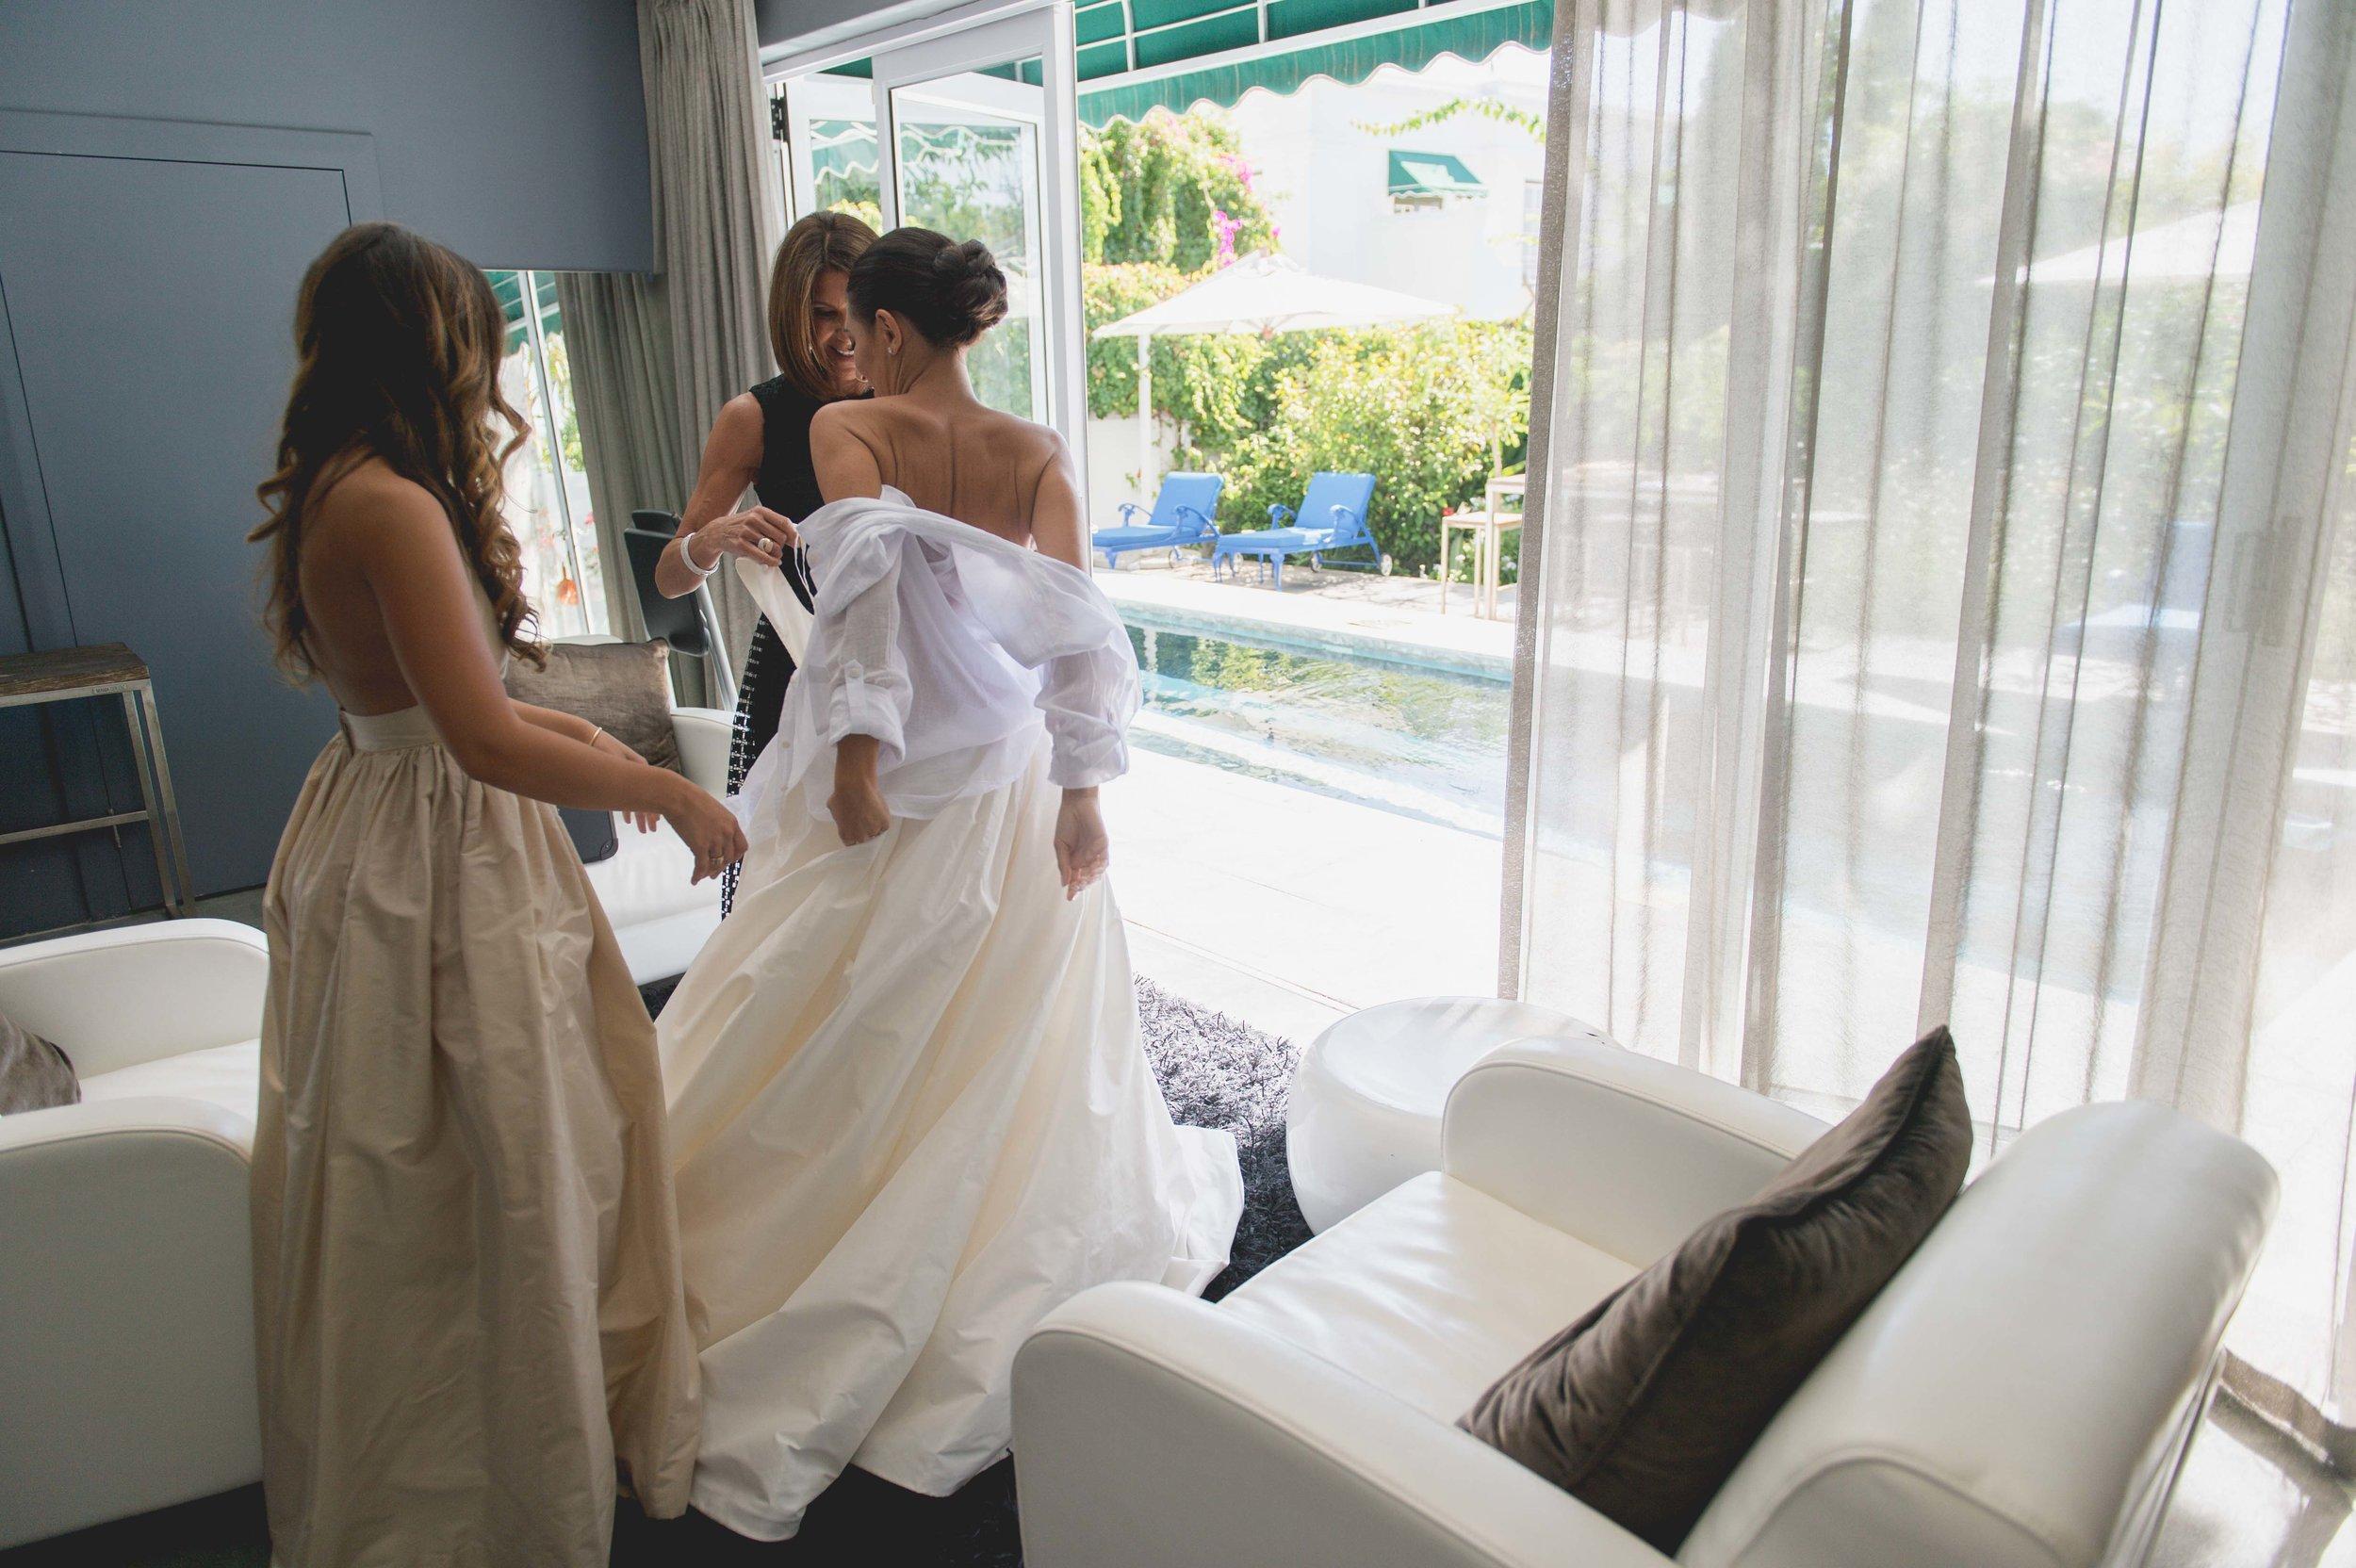 john-henry-wedding-photographer-bridal-001-6.jpg